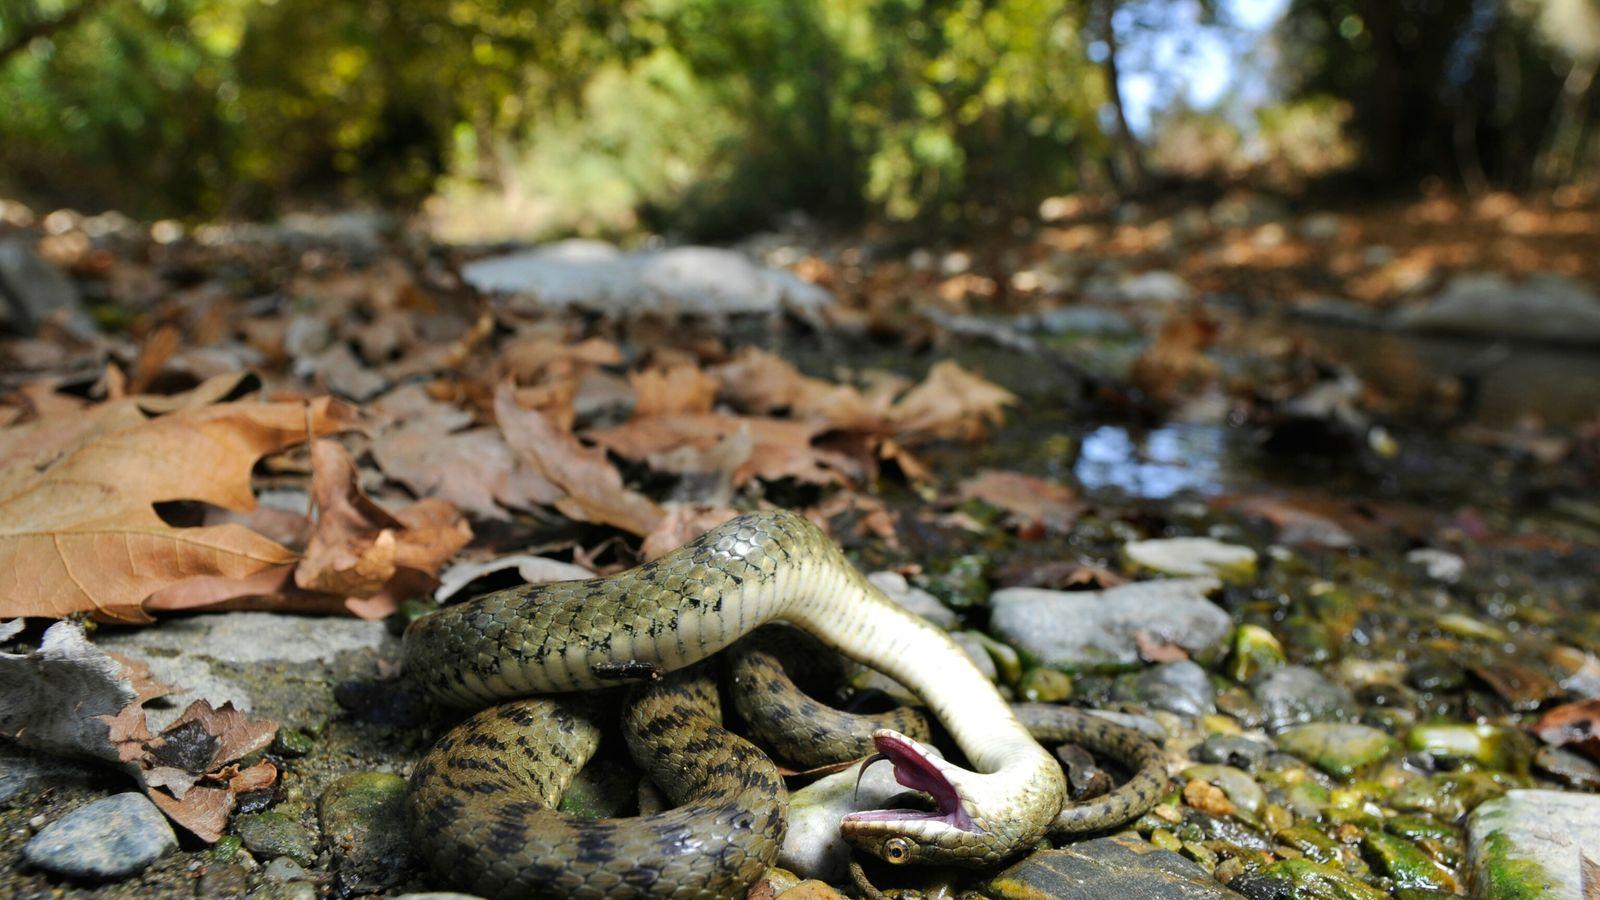 snake-feining-death-02